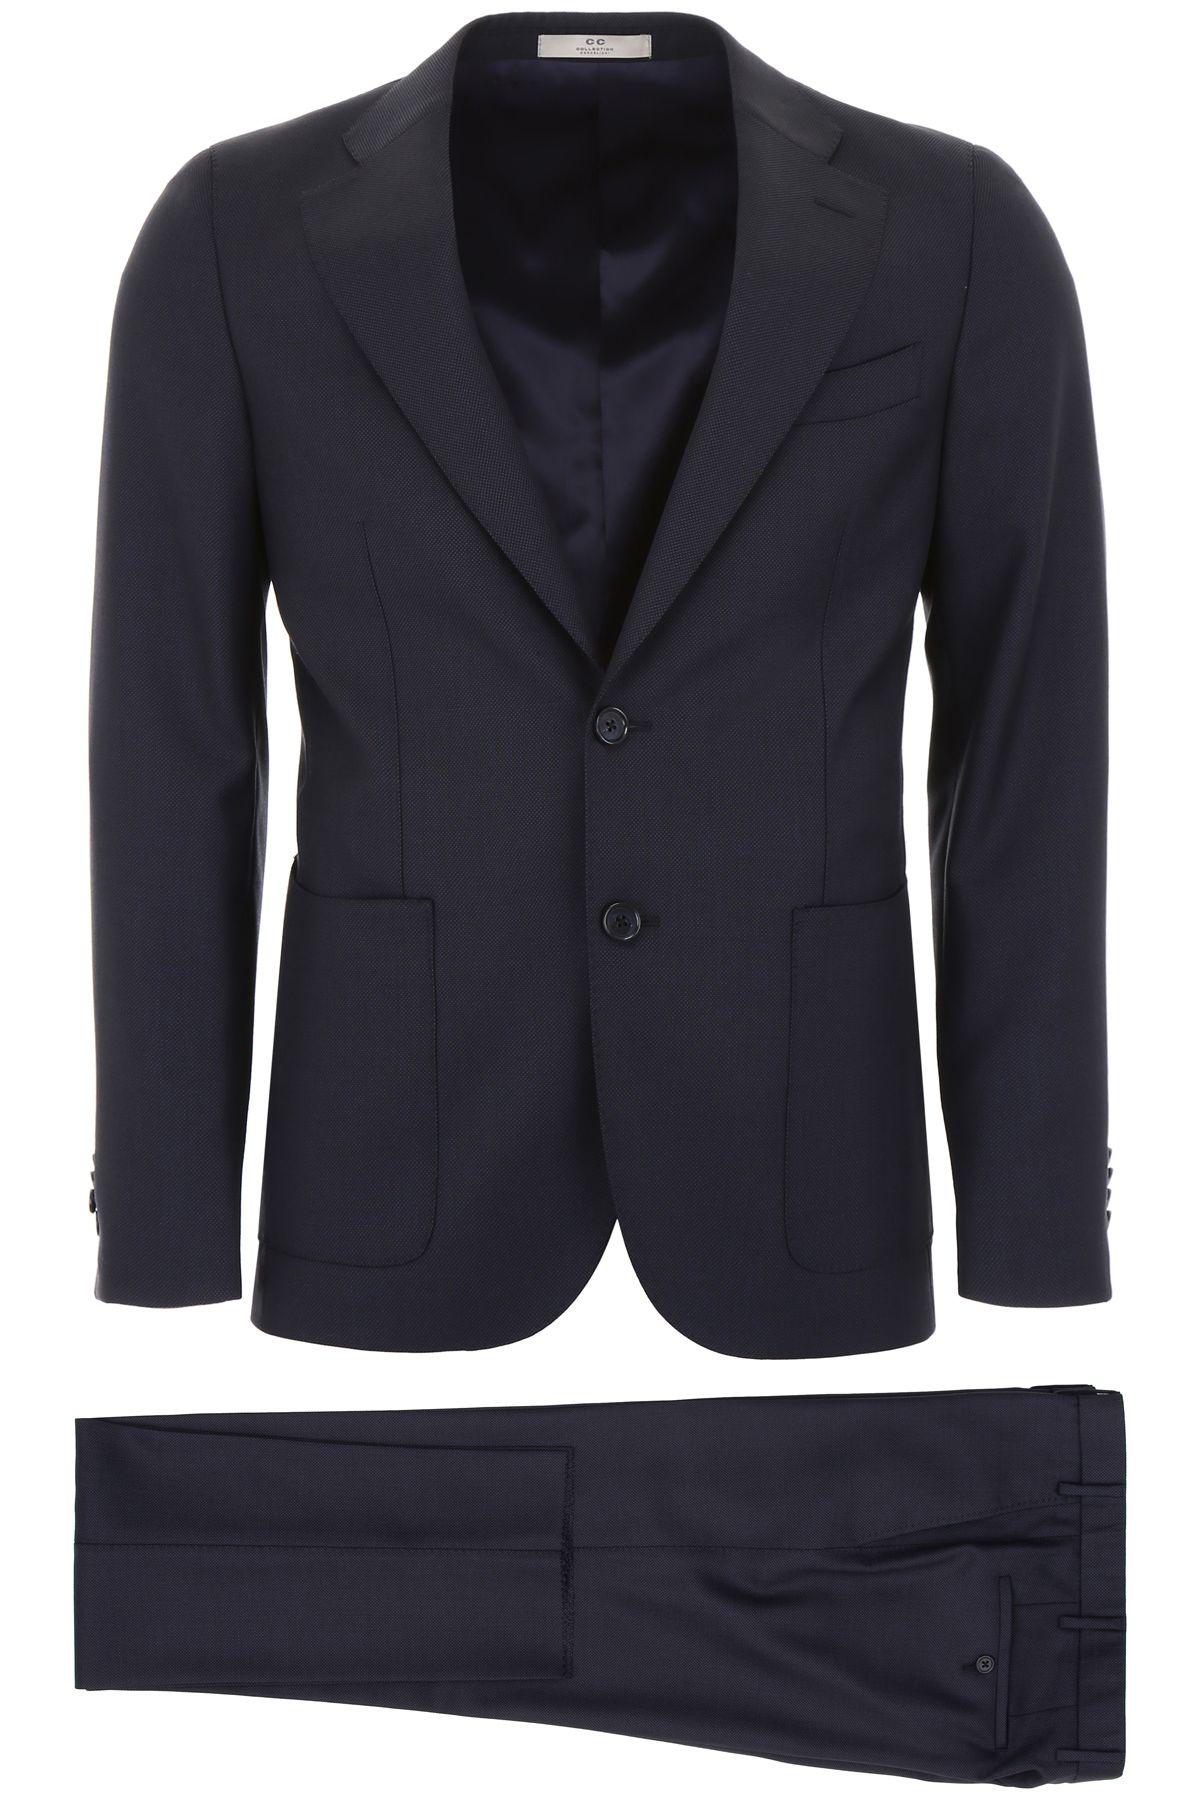 CC COLLECTION CORNELIANI Virgin Wool Suit in Navy